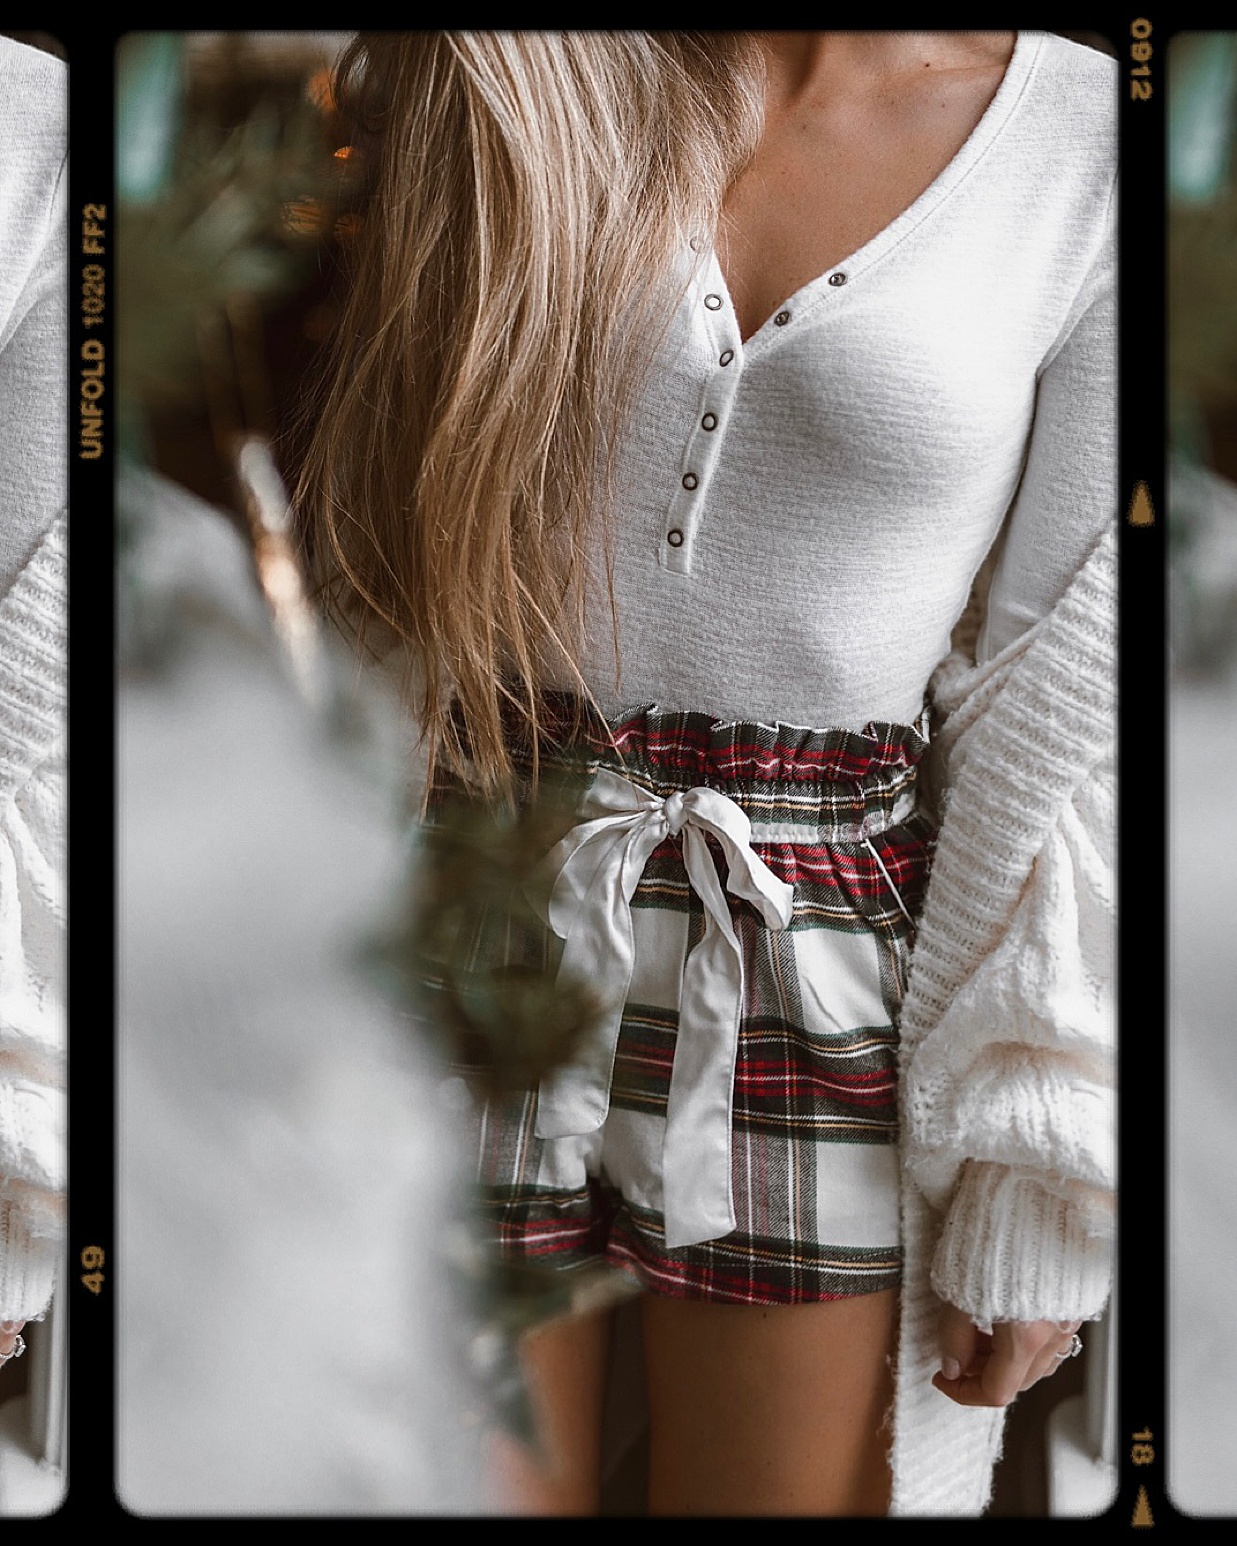 abercrombie, abercrombie sale, abercrombie code, olivia rink abercrombie, olivia rink gift guide, blogger gift guide, gift guide for her, holiday gift ideas, girlfriend gift ideas, blogger christmas list